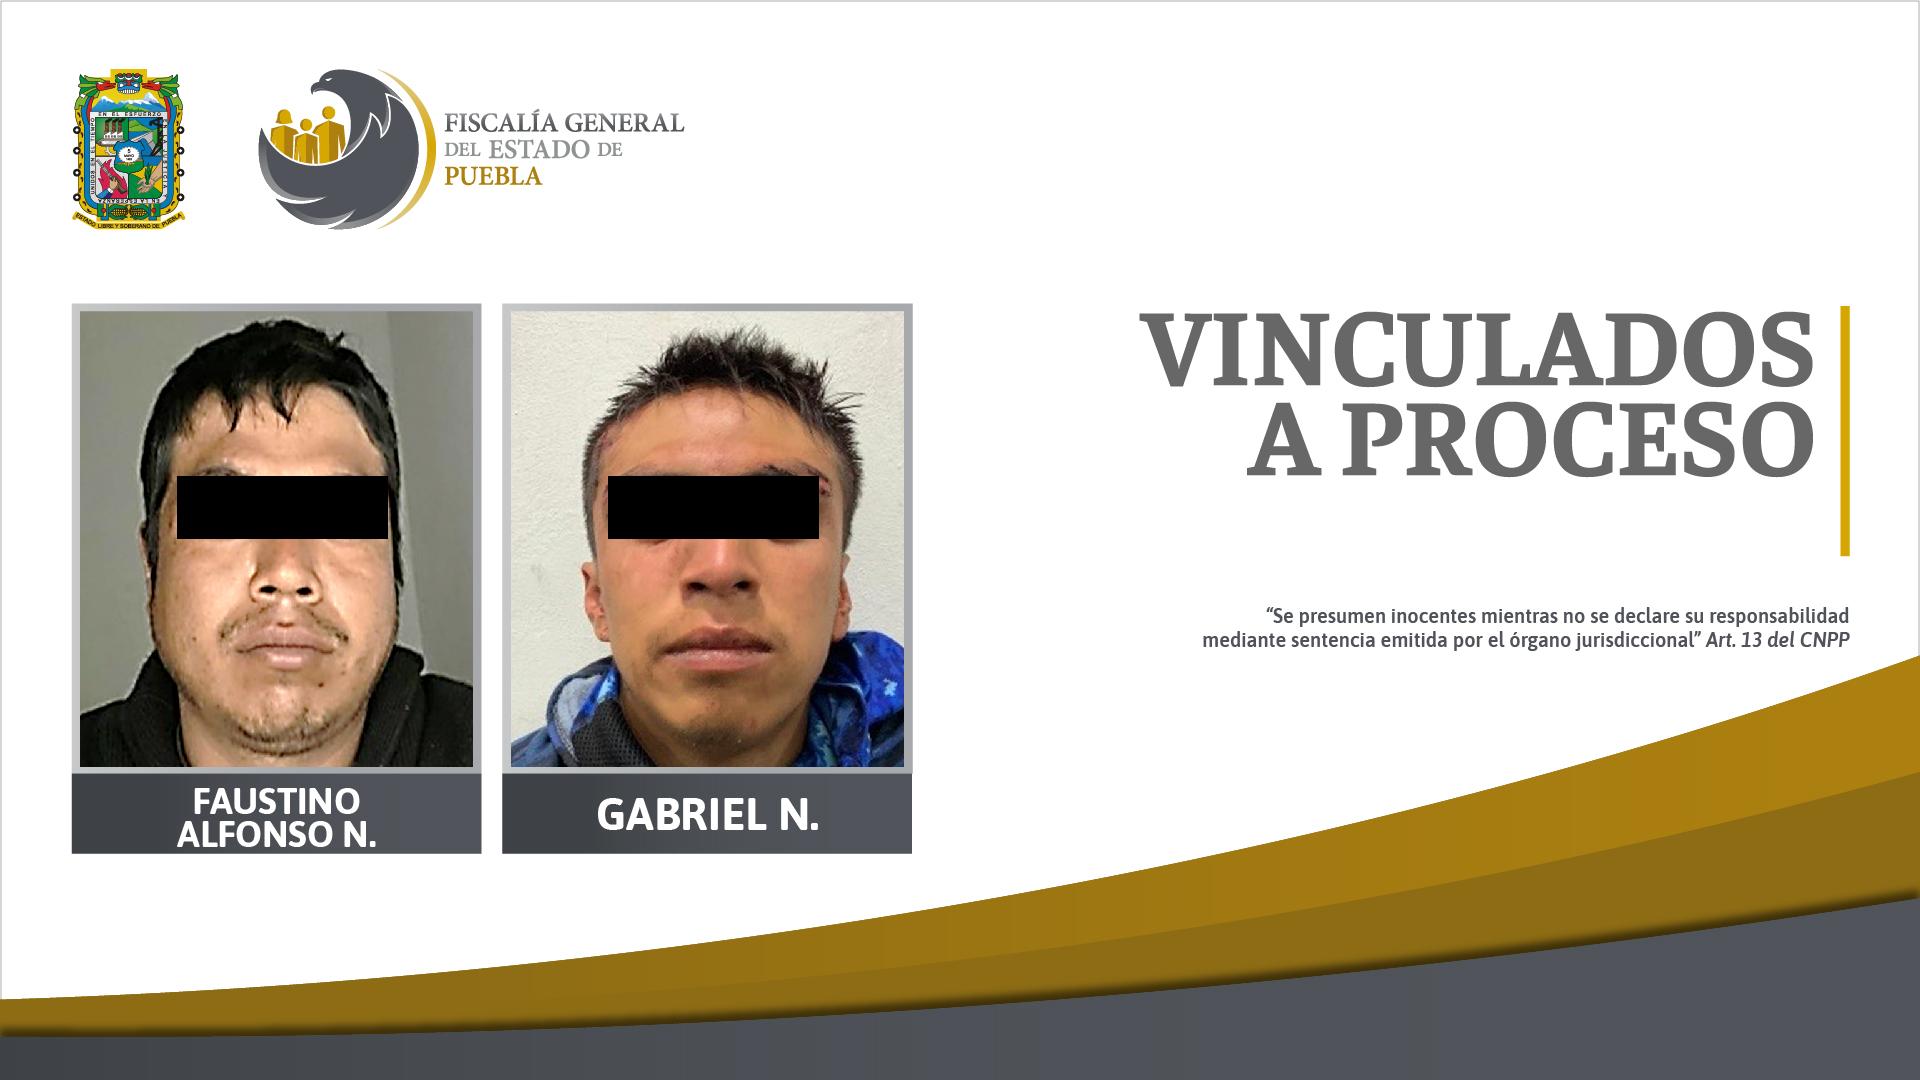 Detenidos por robo en Teteles, en prisión preventiva